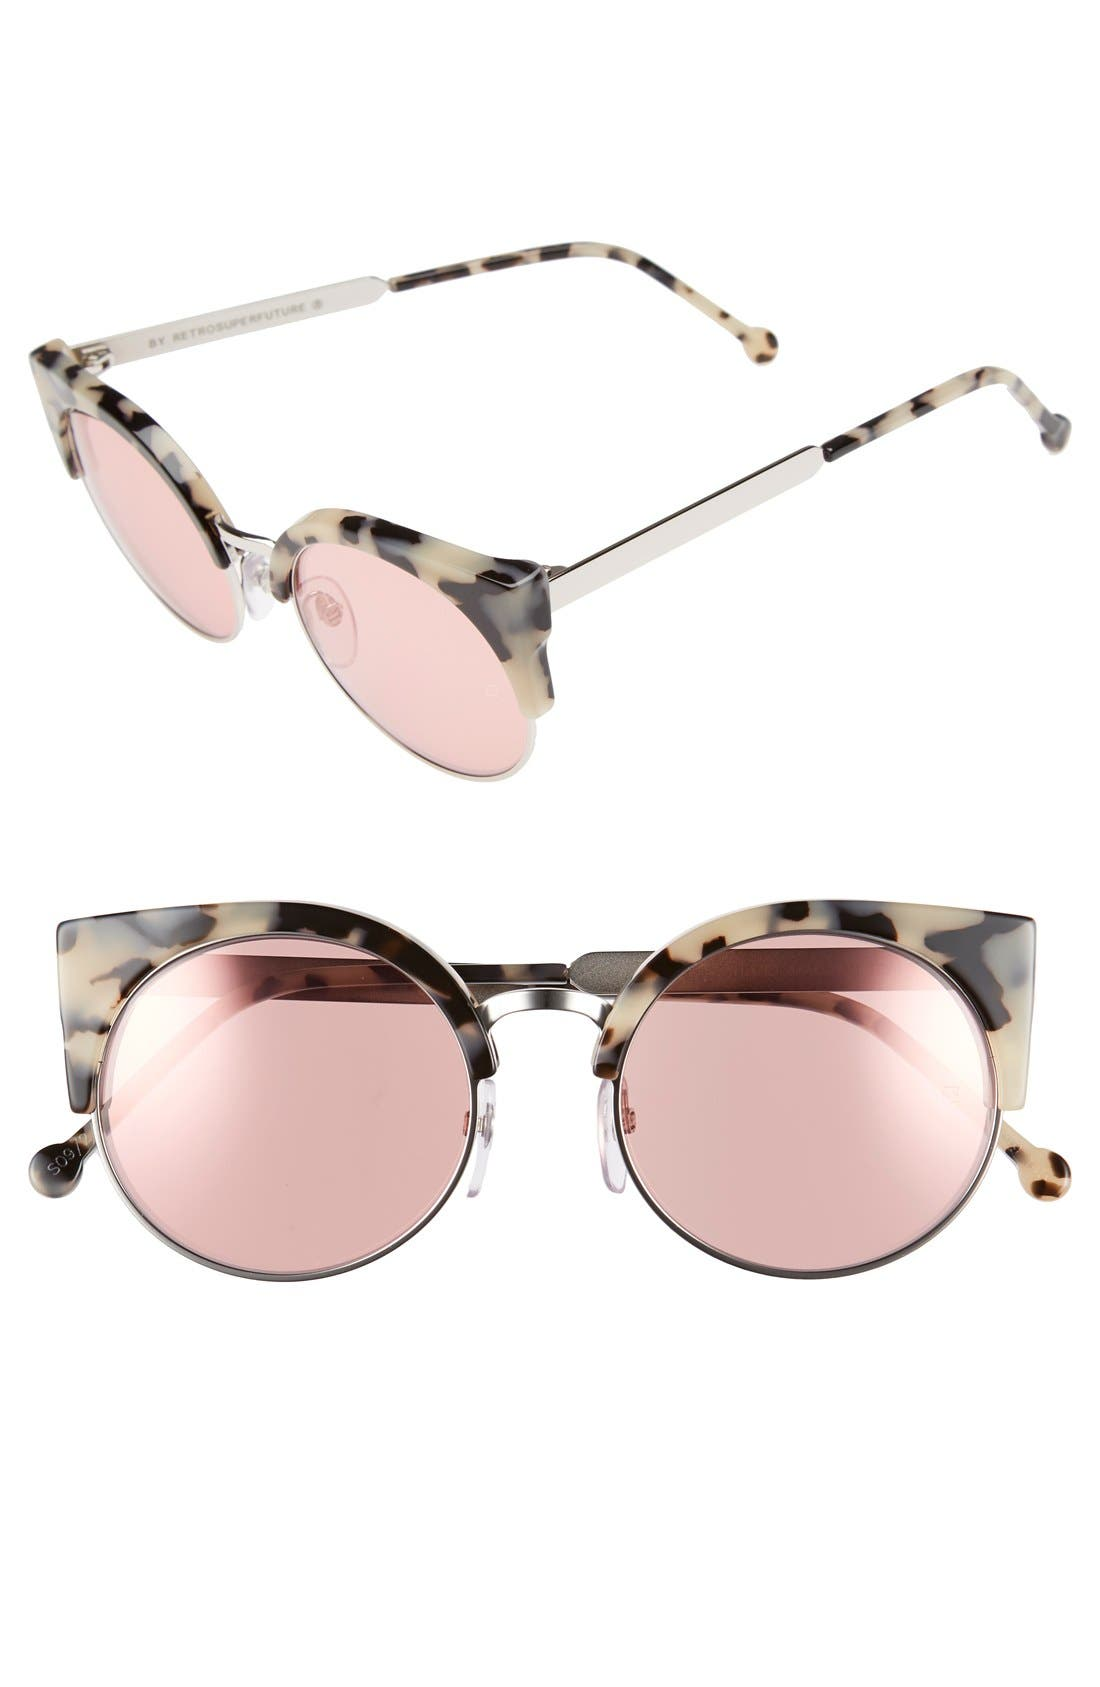 Alternate Image 1 Selected - SUPER by RETROSUPERFUTURE® 'Ilaria Gel' 55mm Cat Eye Sunglasses